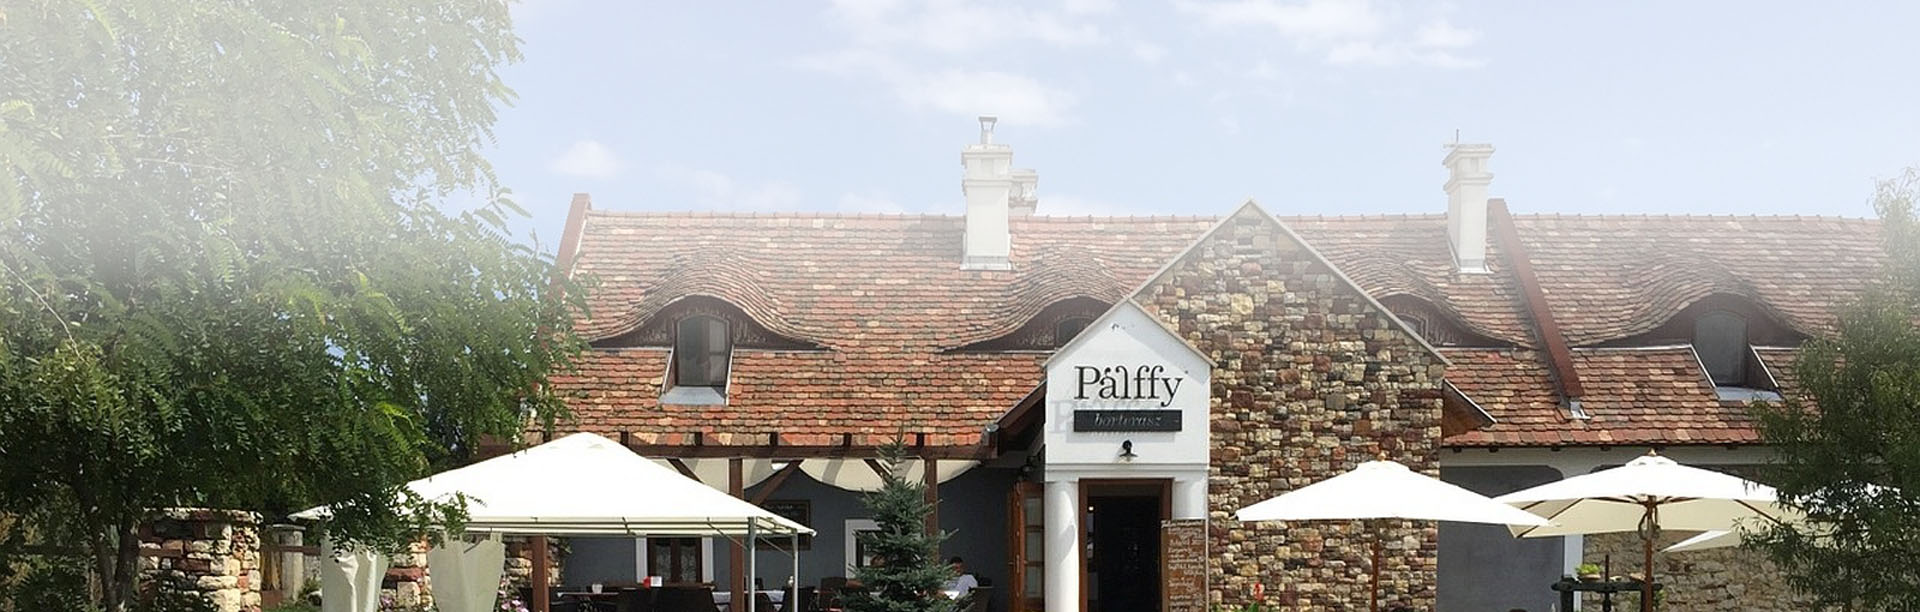 palffy